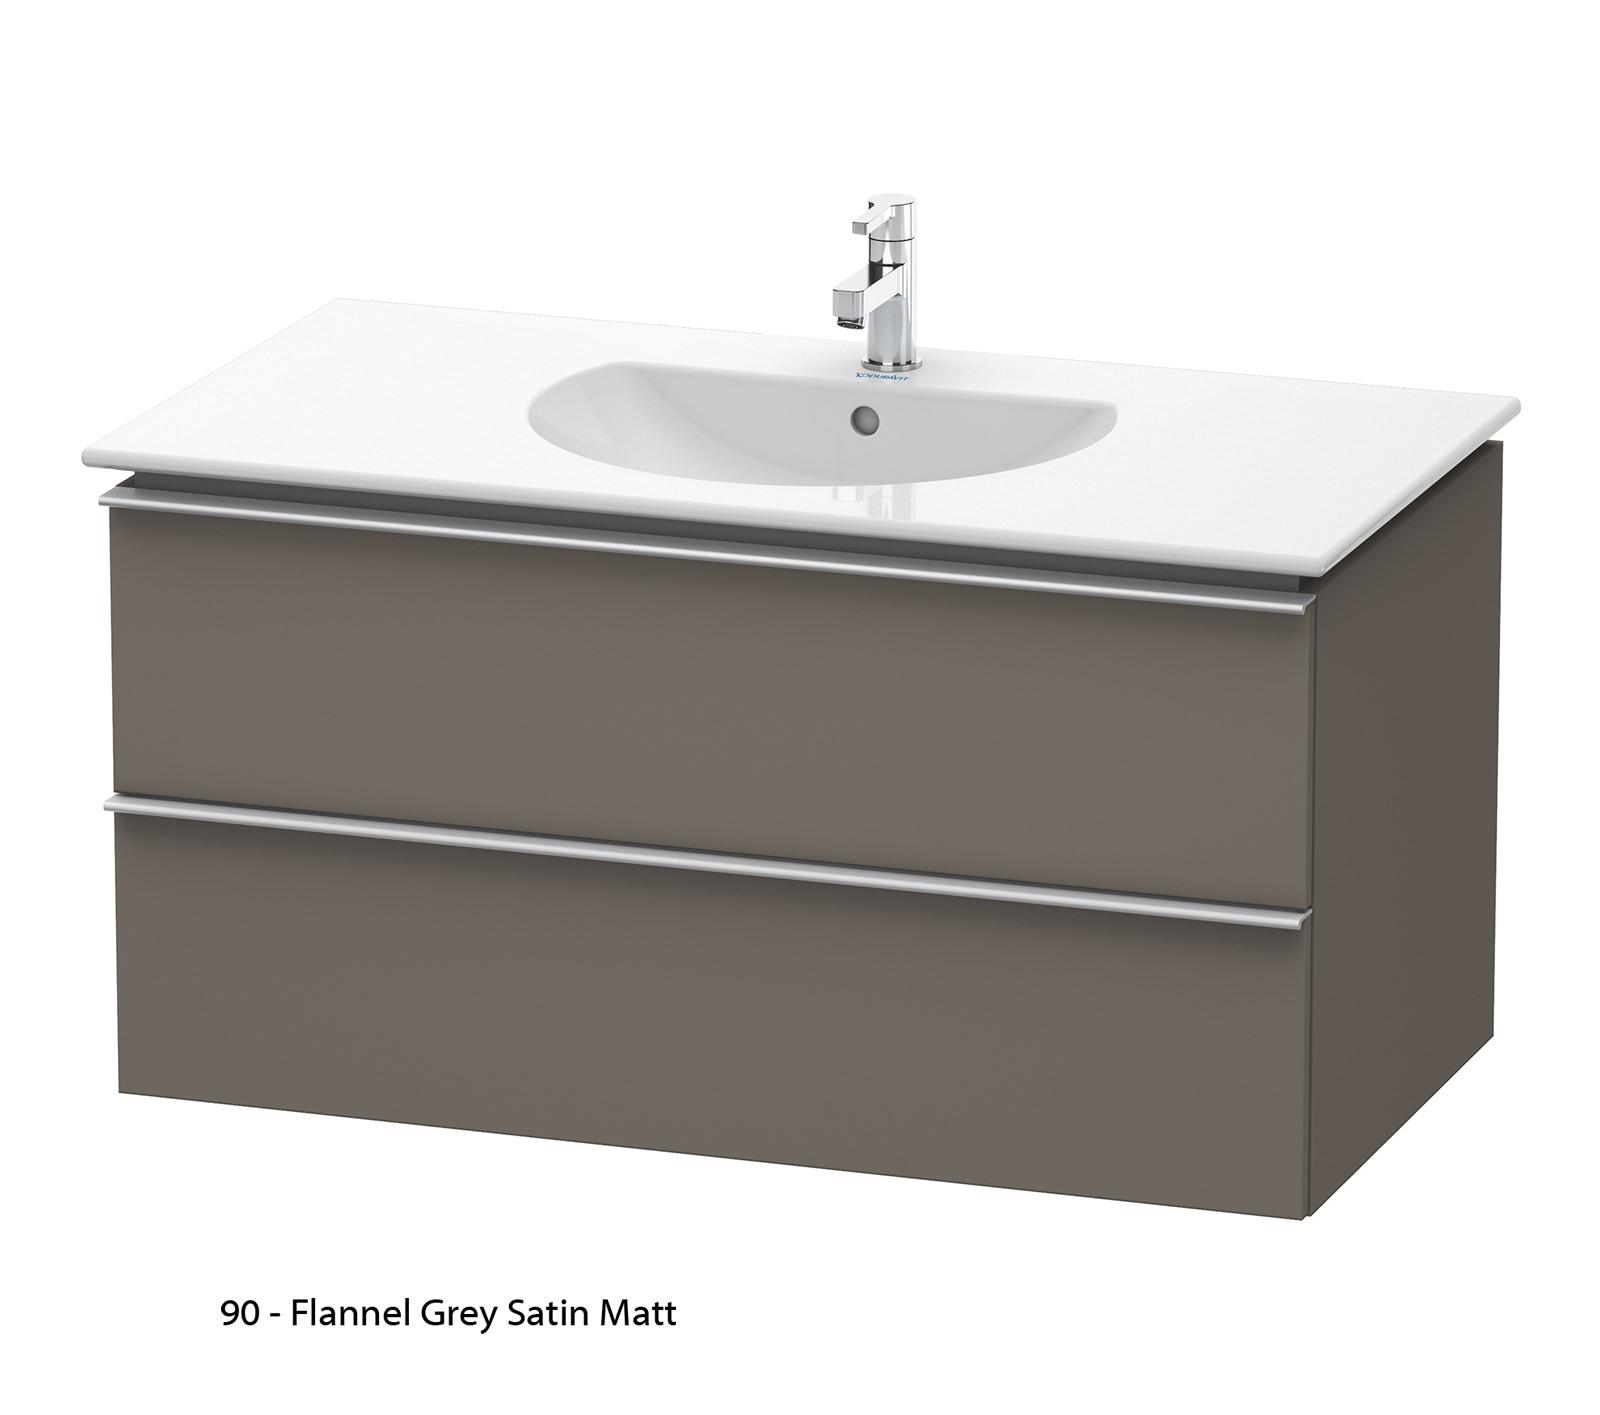 duravit darling new 1000mm 2 drawers terra vanity unit. Black Bedroom Furniture Sets. Home Design Ideas